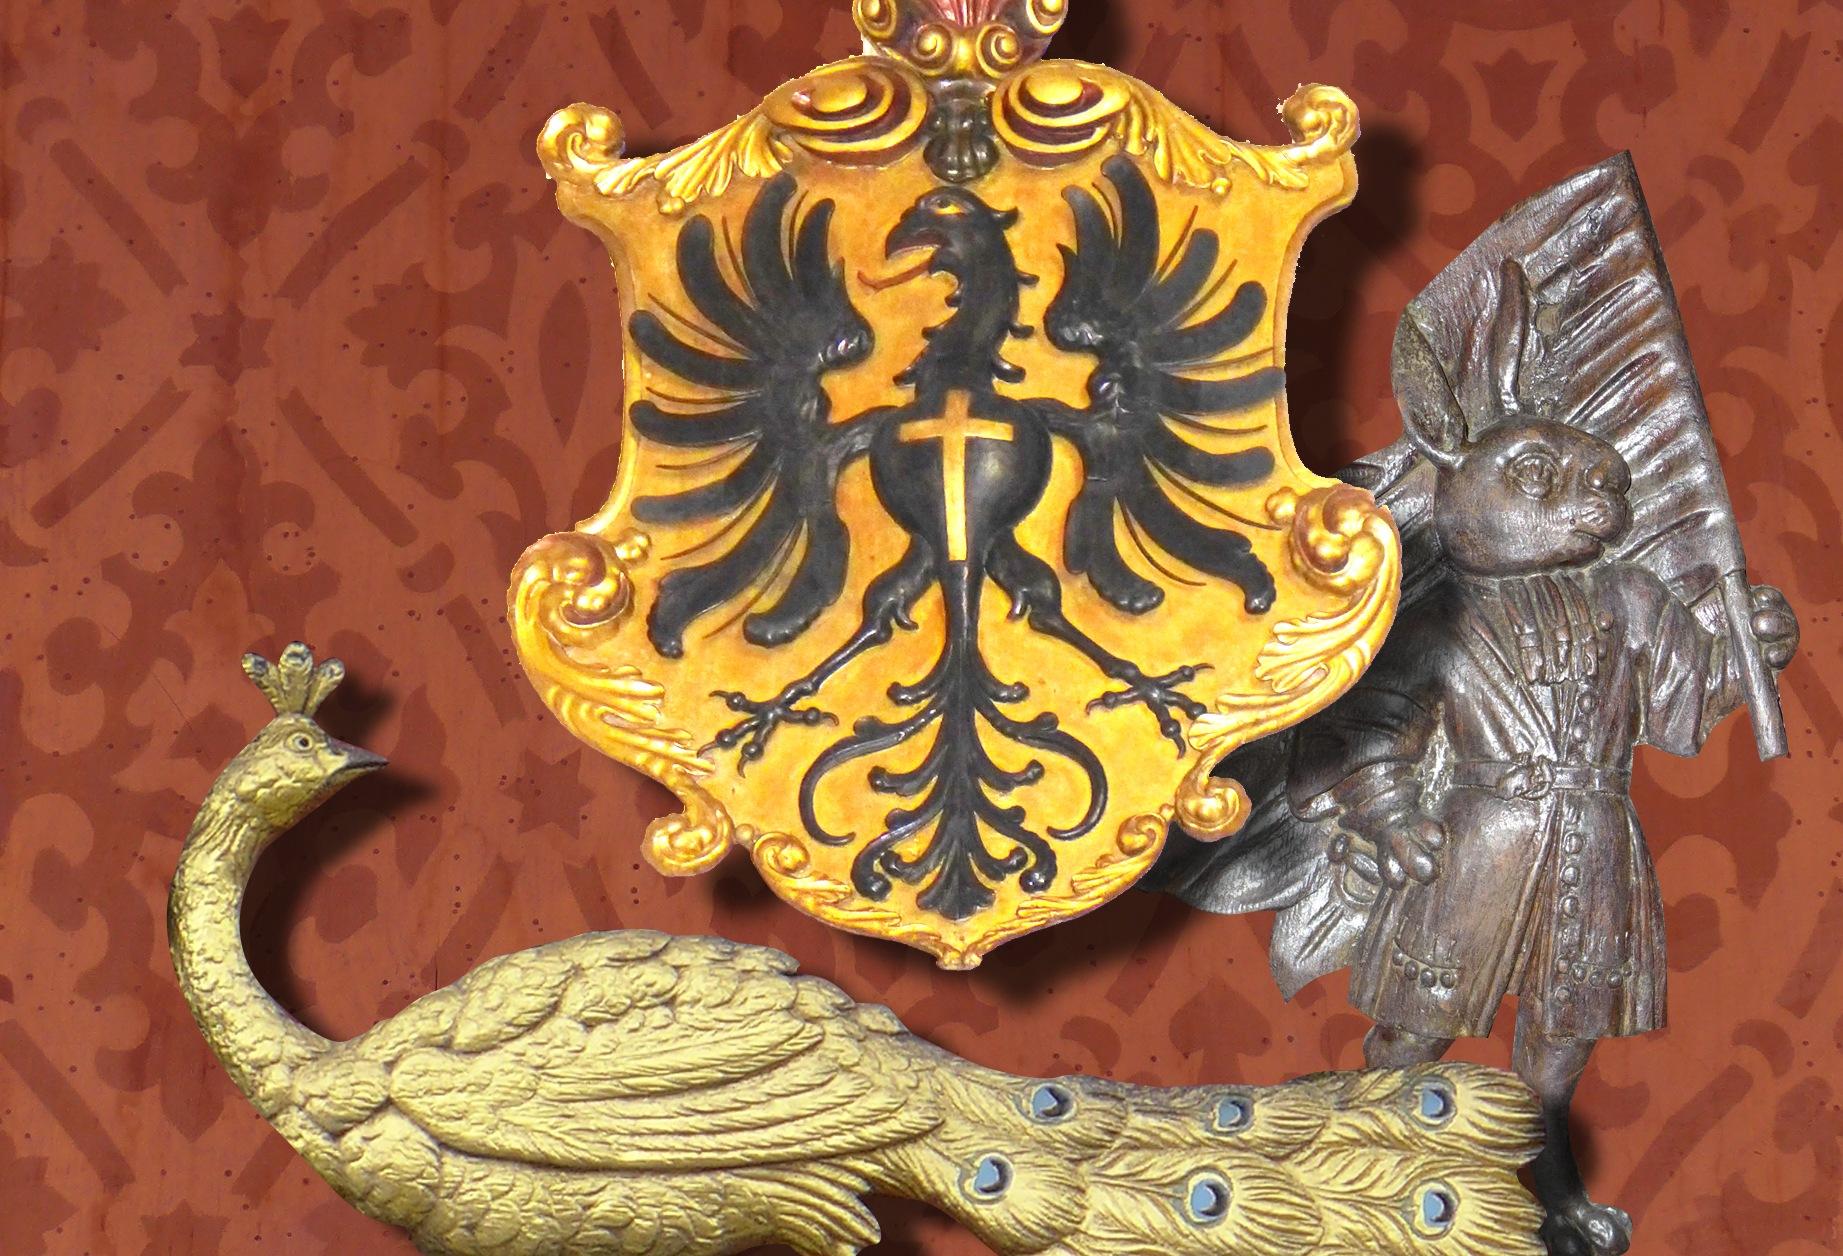 Rottweil, Familienfuehrung, Stadtführung ,Erkerbilder, Fassaden, Schmuck, historisch, Älteste Stadt Baden Württembergs